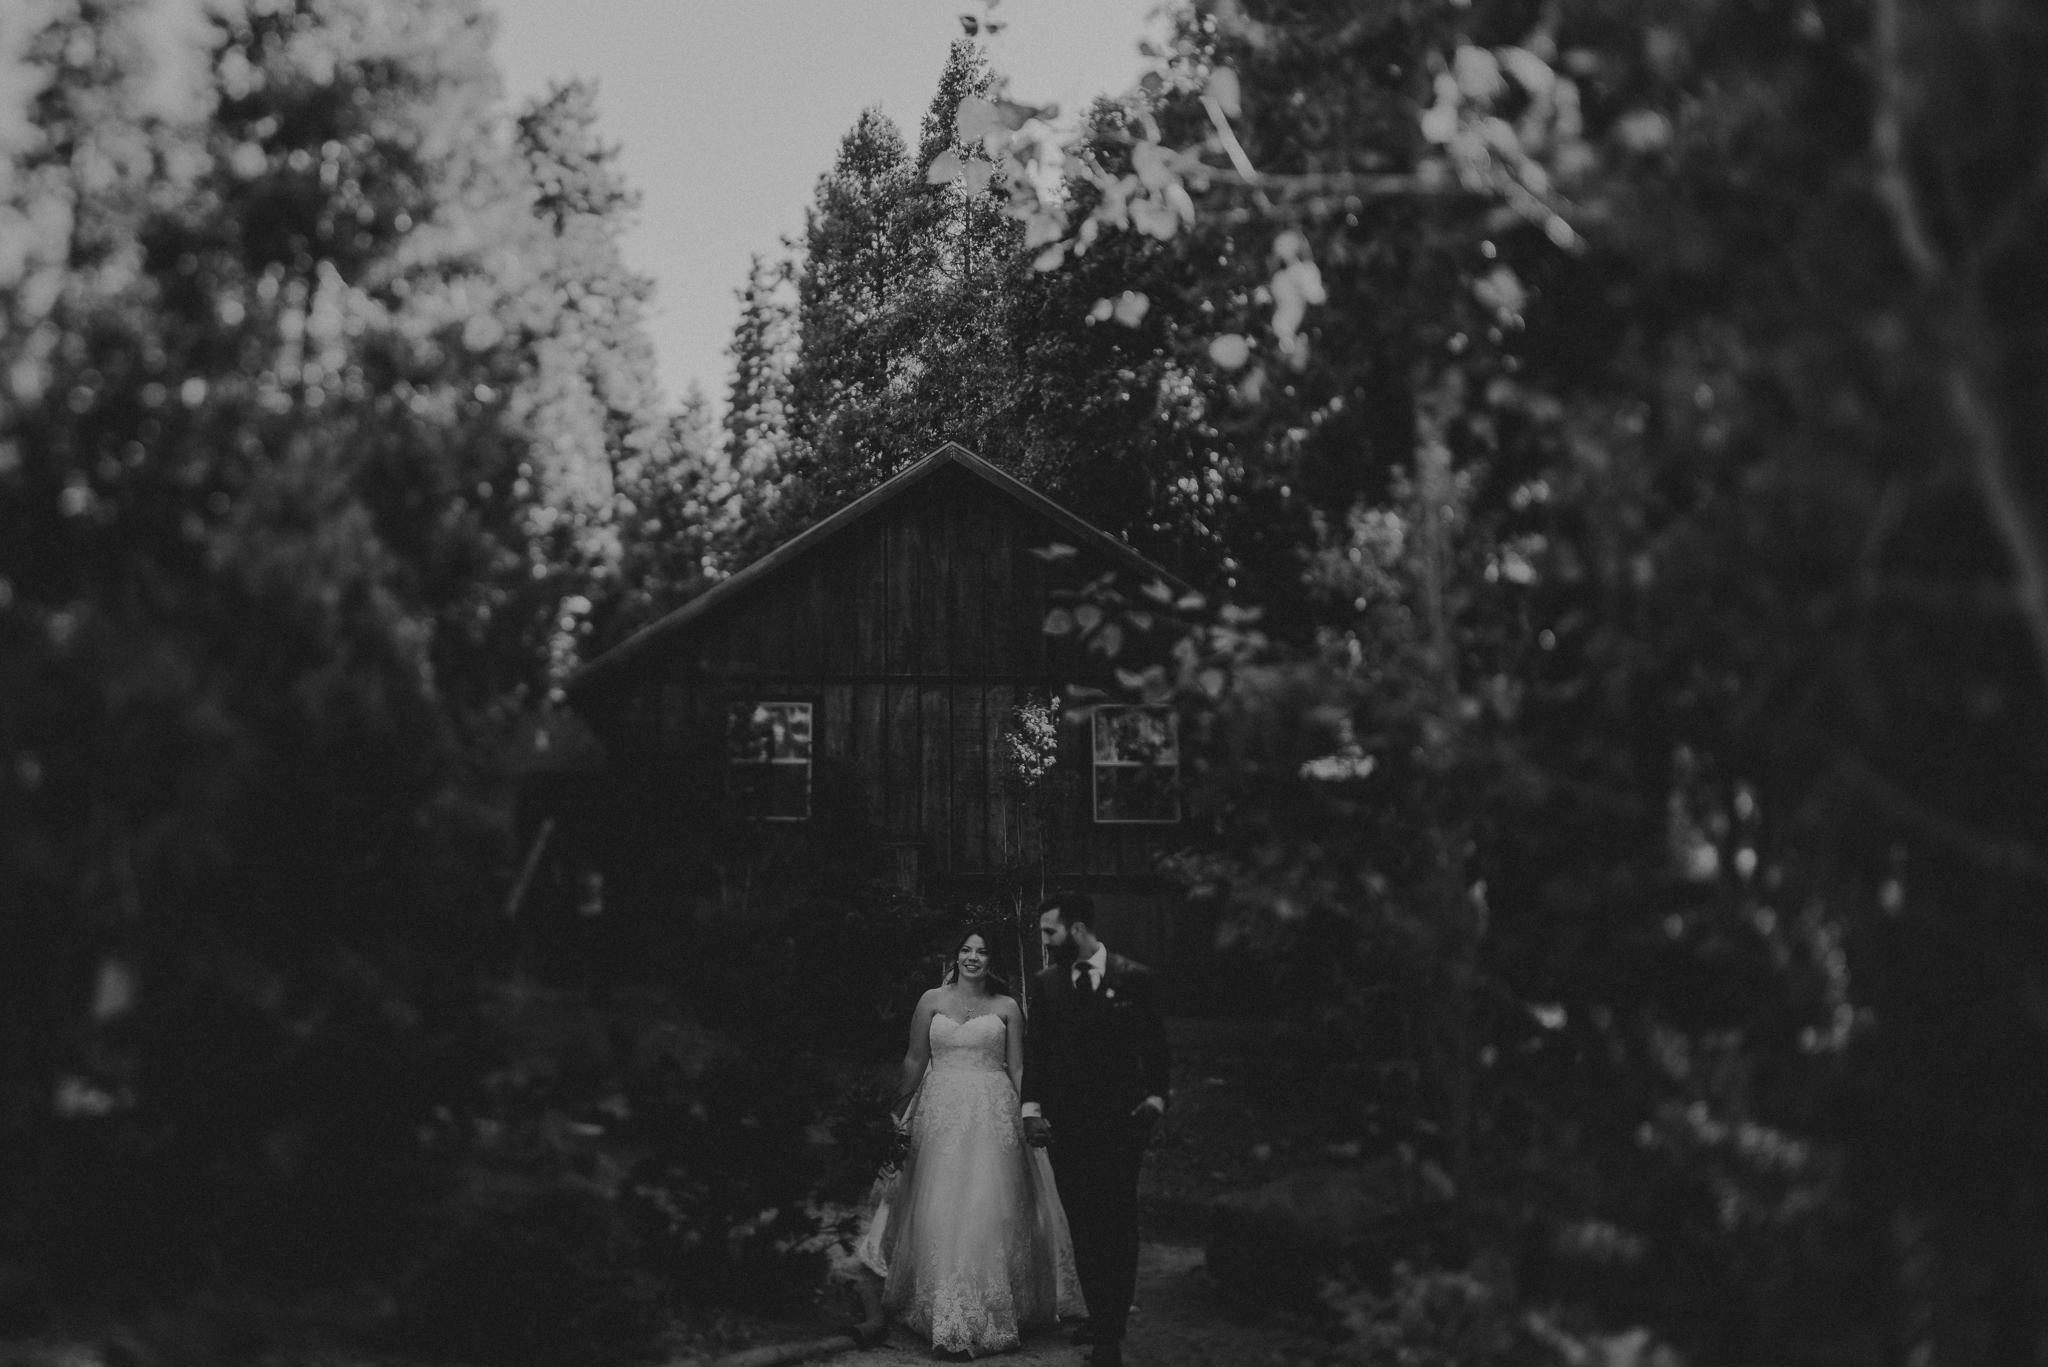 Yosemite Elopement Photographer - Evergreen Lodge Wedding Photographer - IsaiahAndTaylor.com-106.jpg